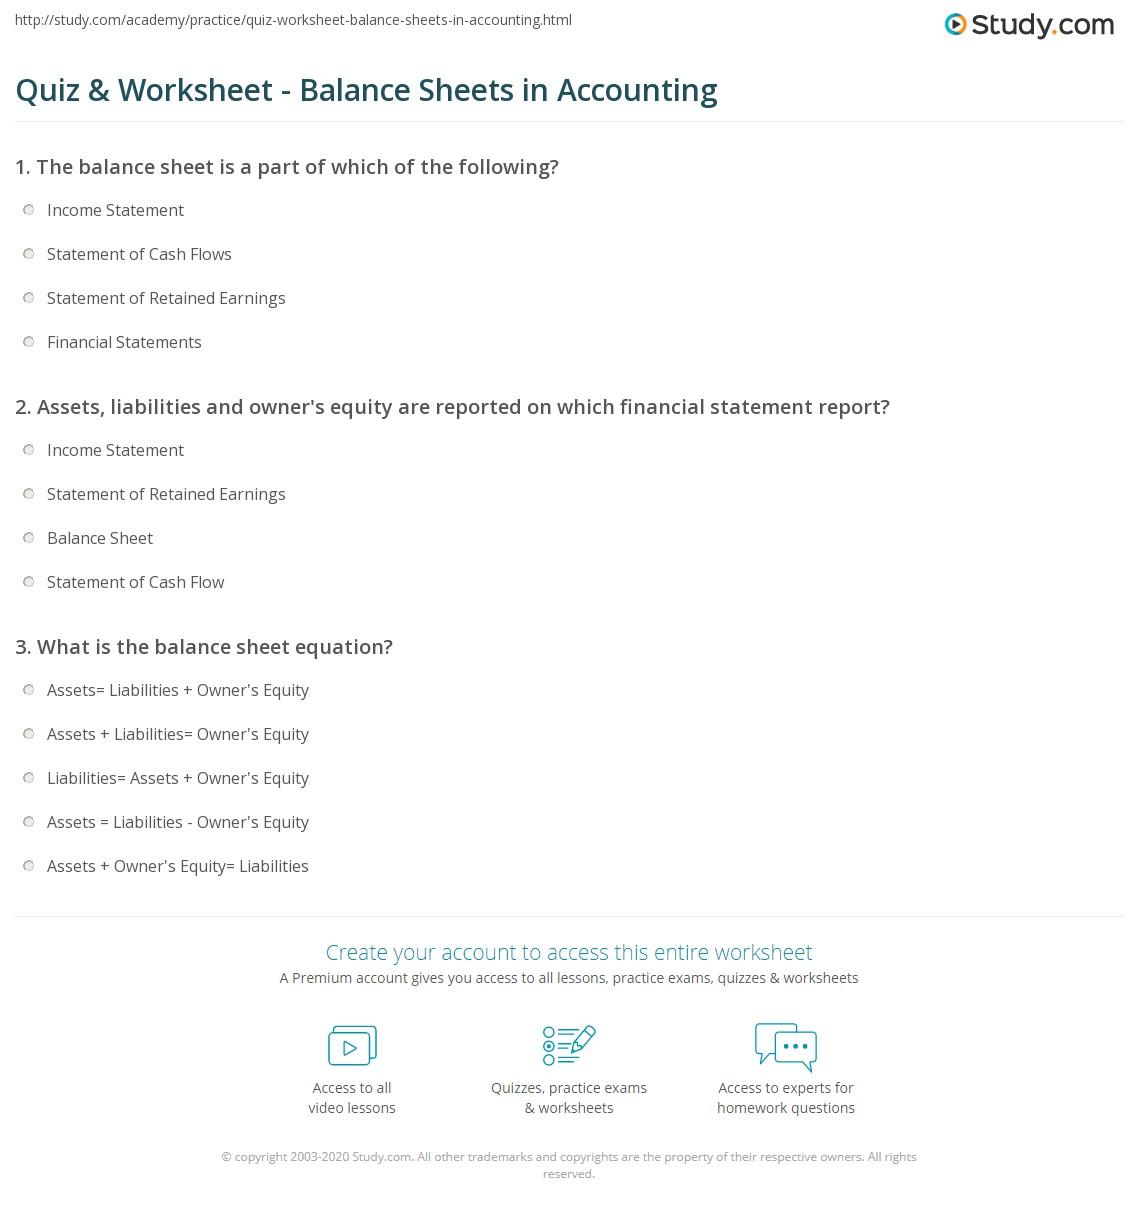 Quiz Worksheet Balance Sheets in Accounting – Components of Balance Sheet